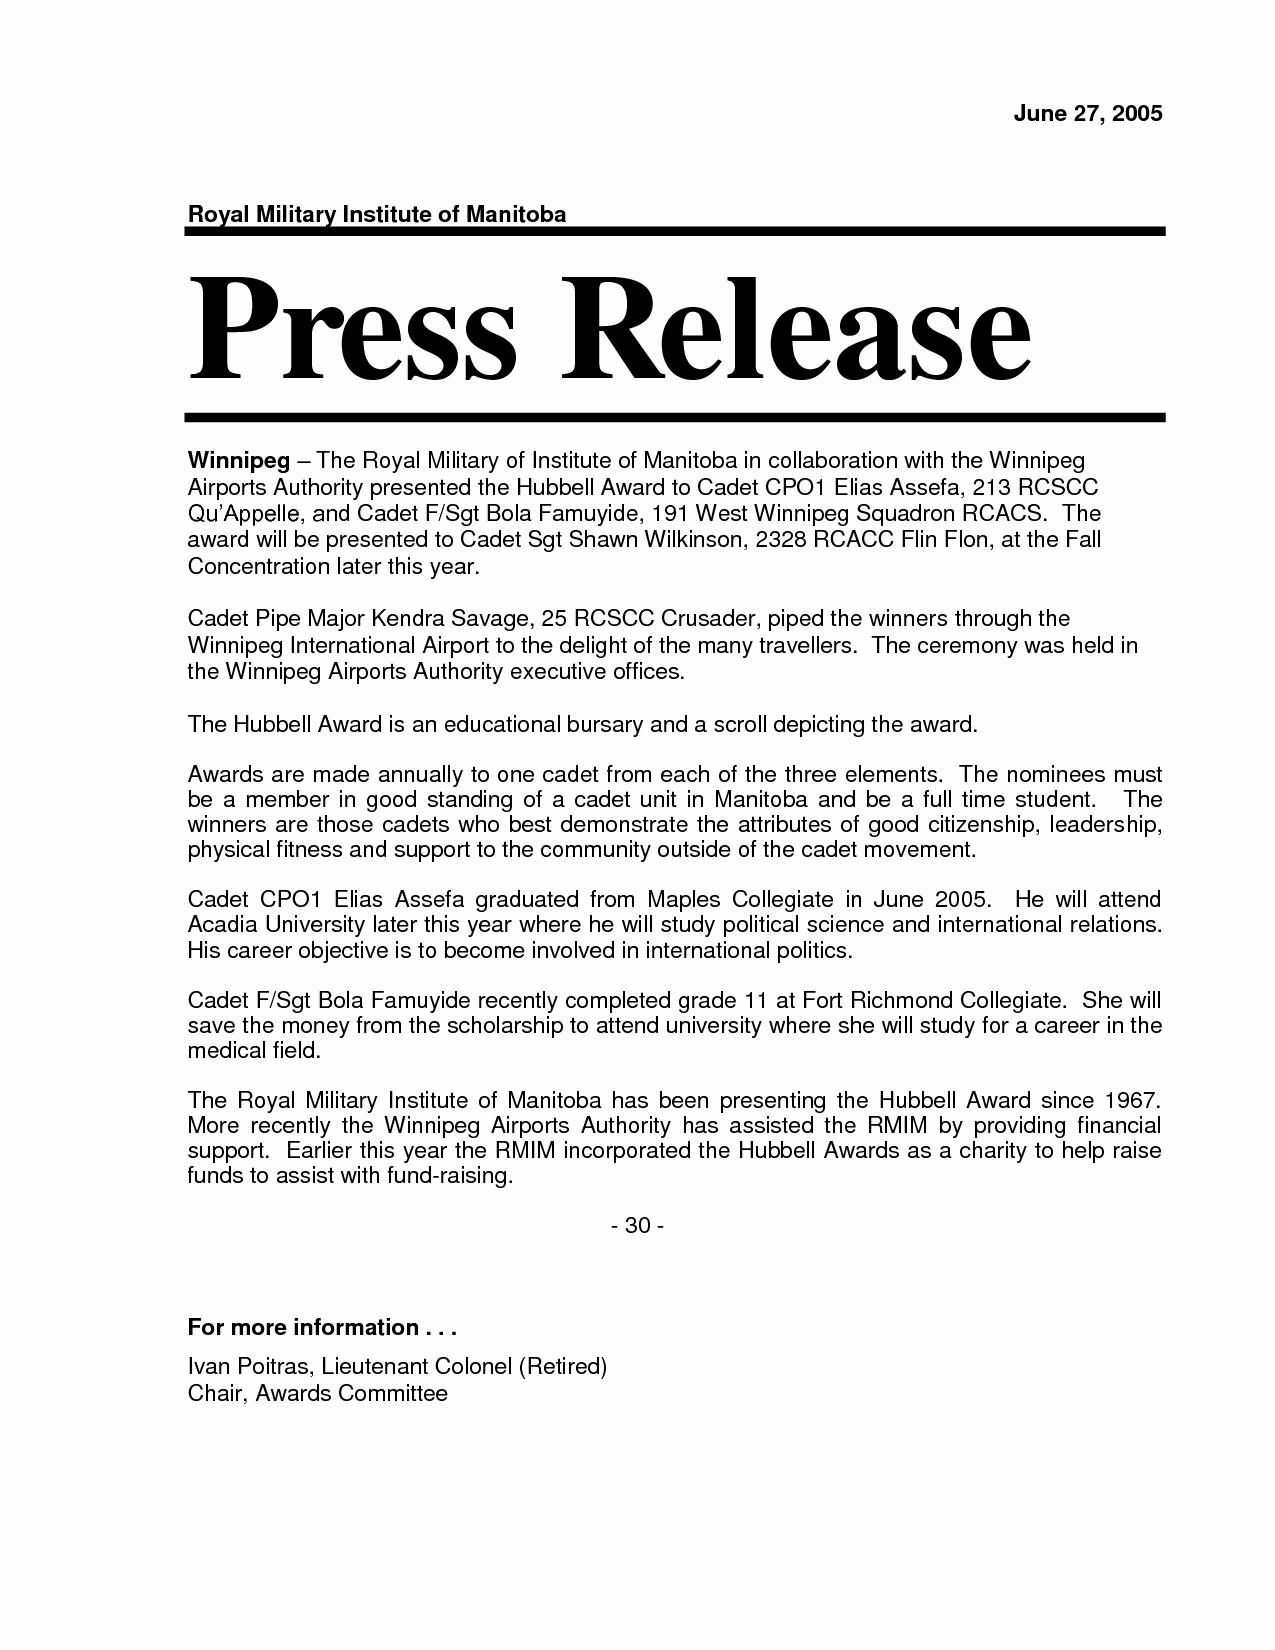 Release Press Release Template